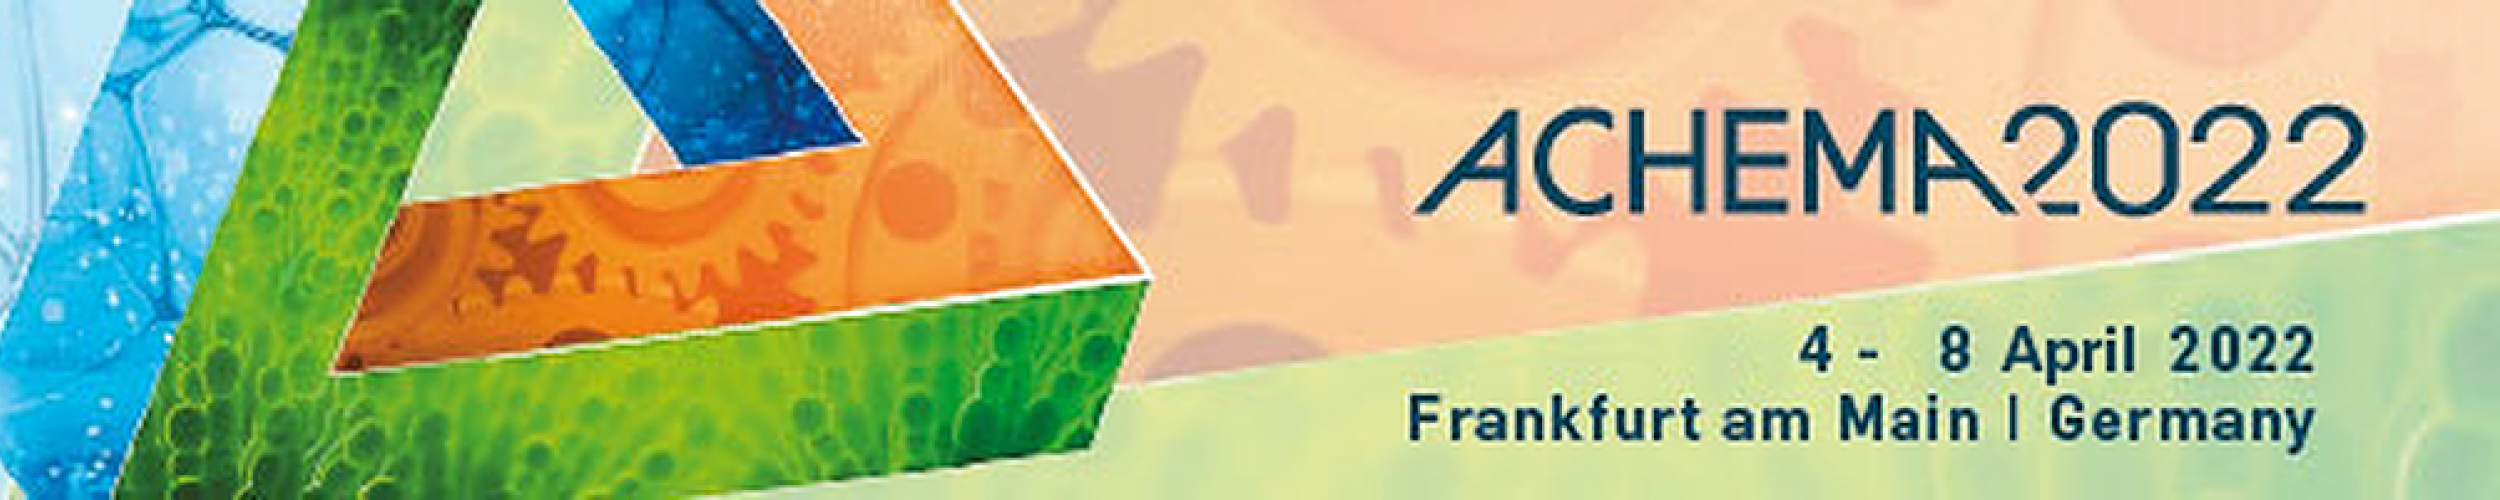 4 - 8 April | ACHEMA 22 | Frankfurt am main, Germany